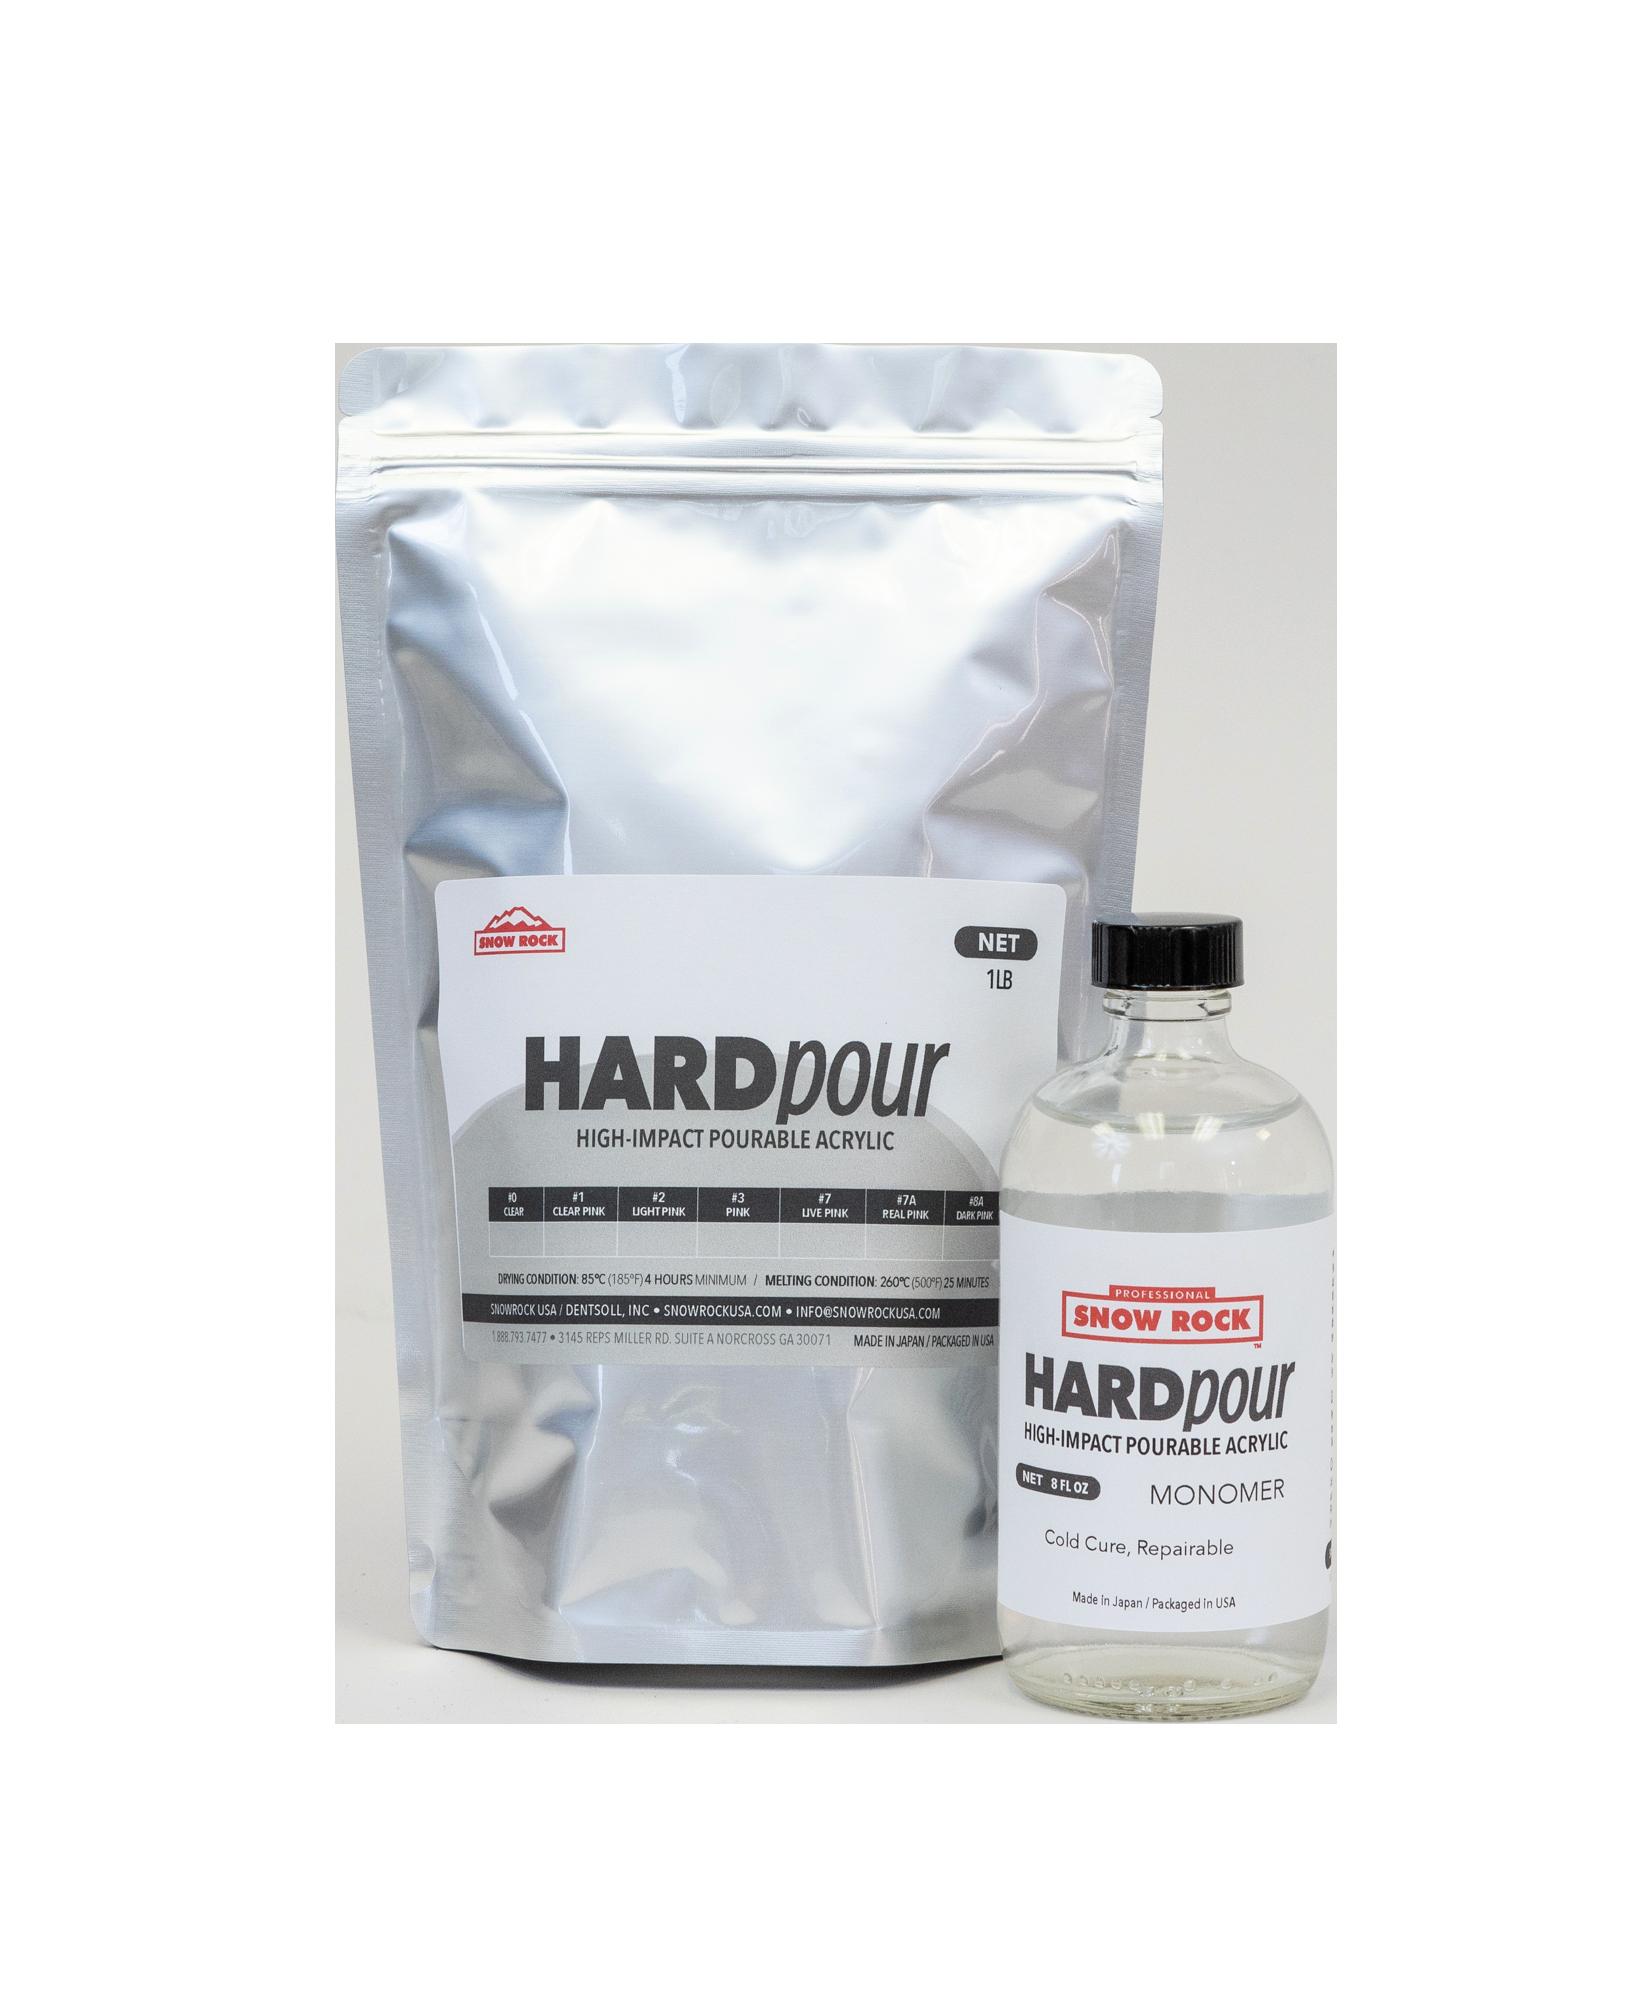 HardPour-Product